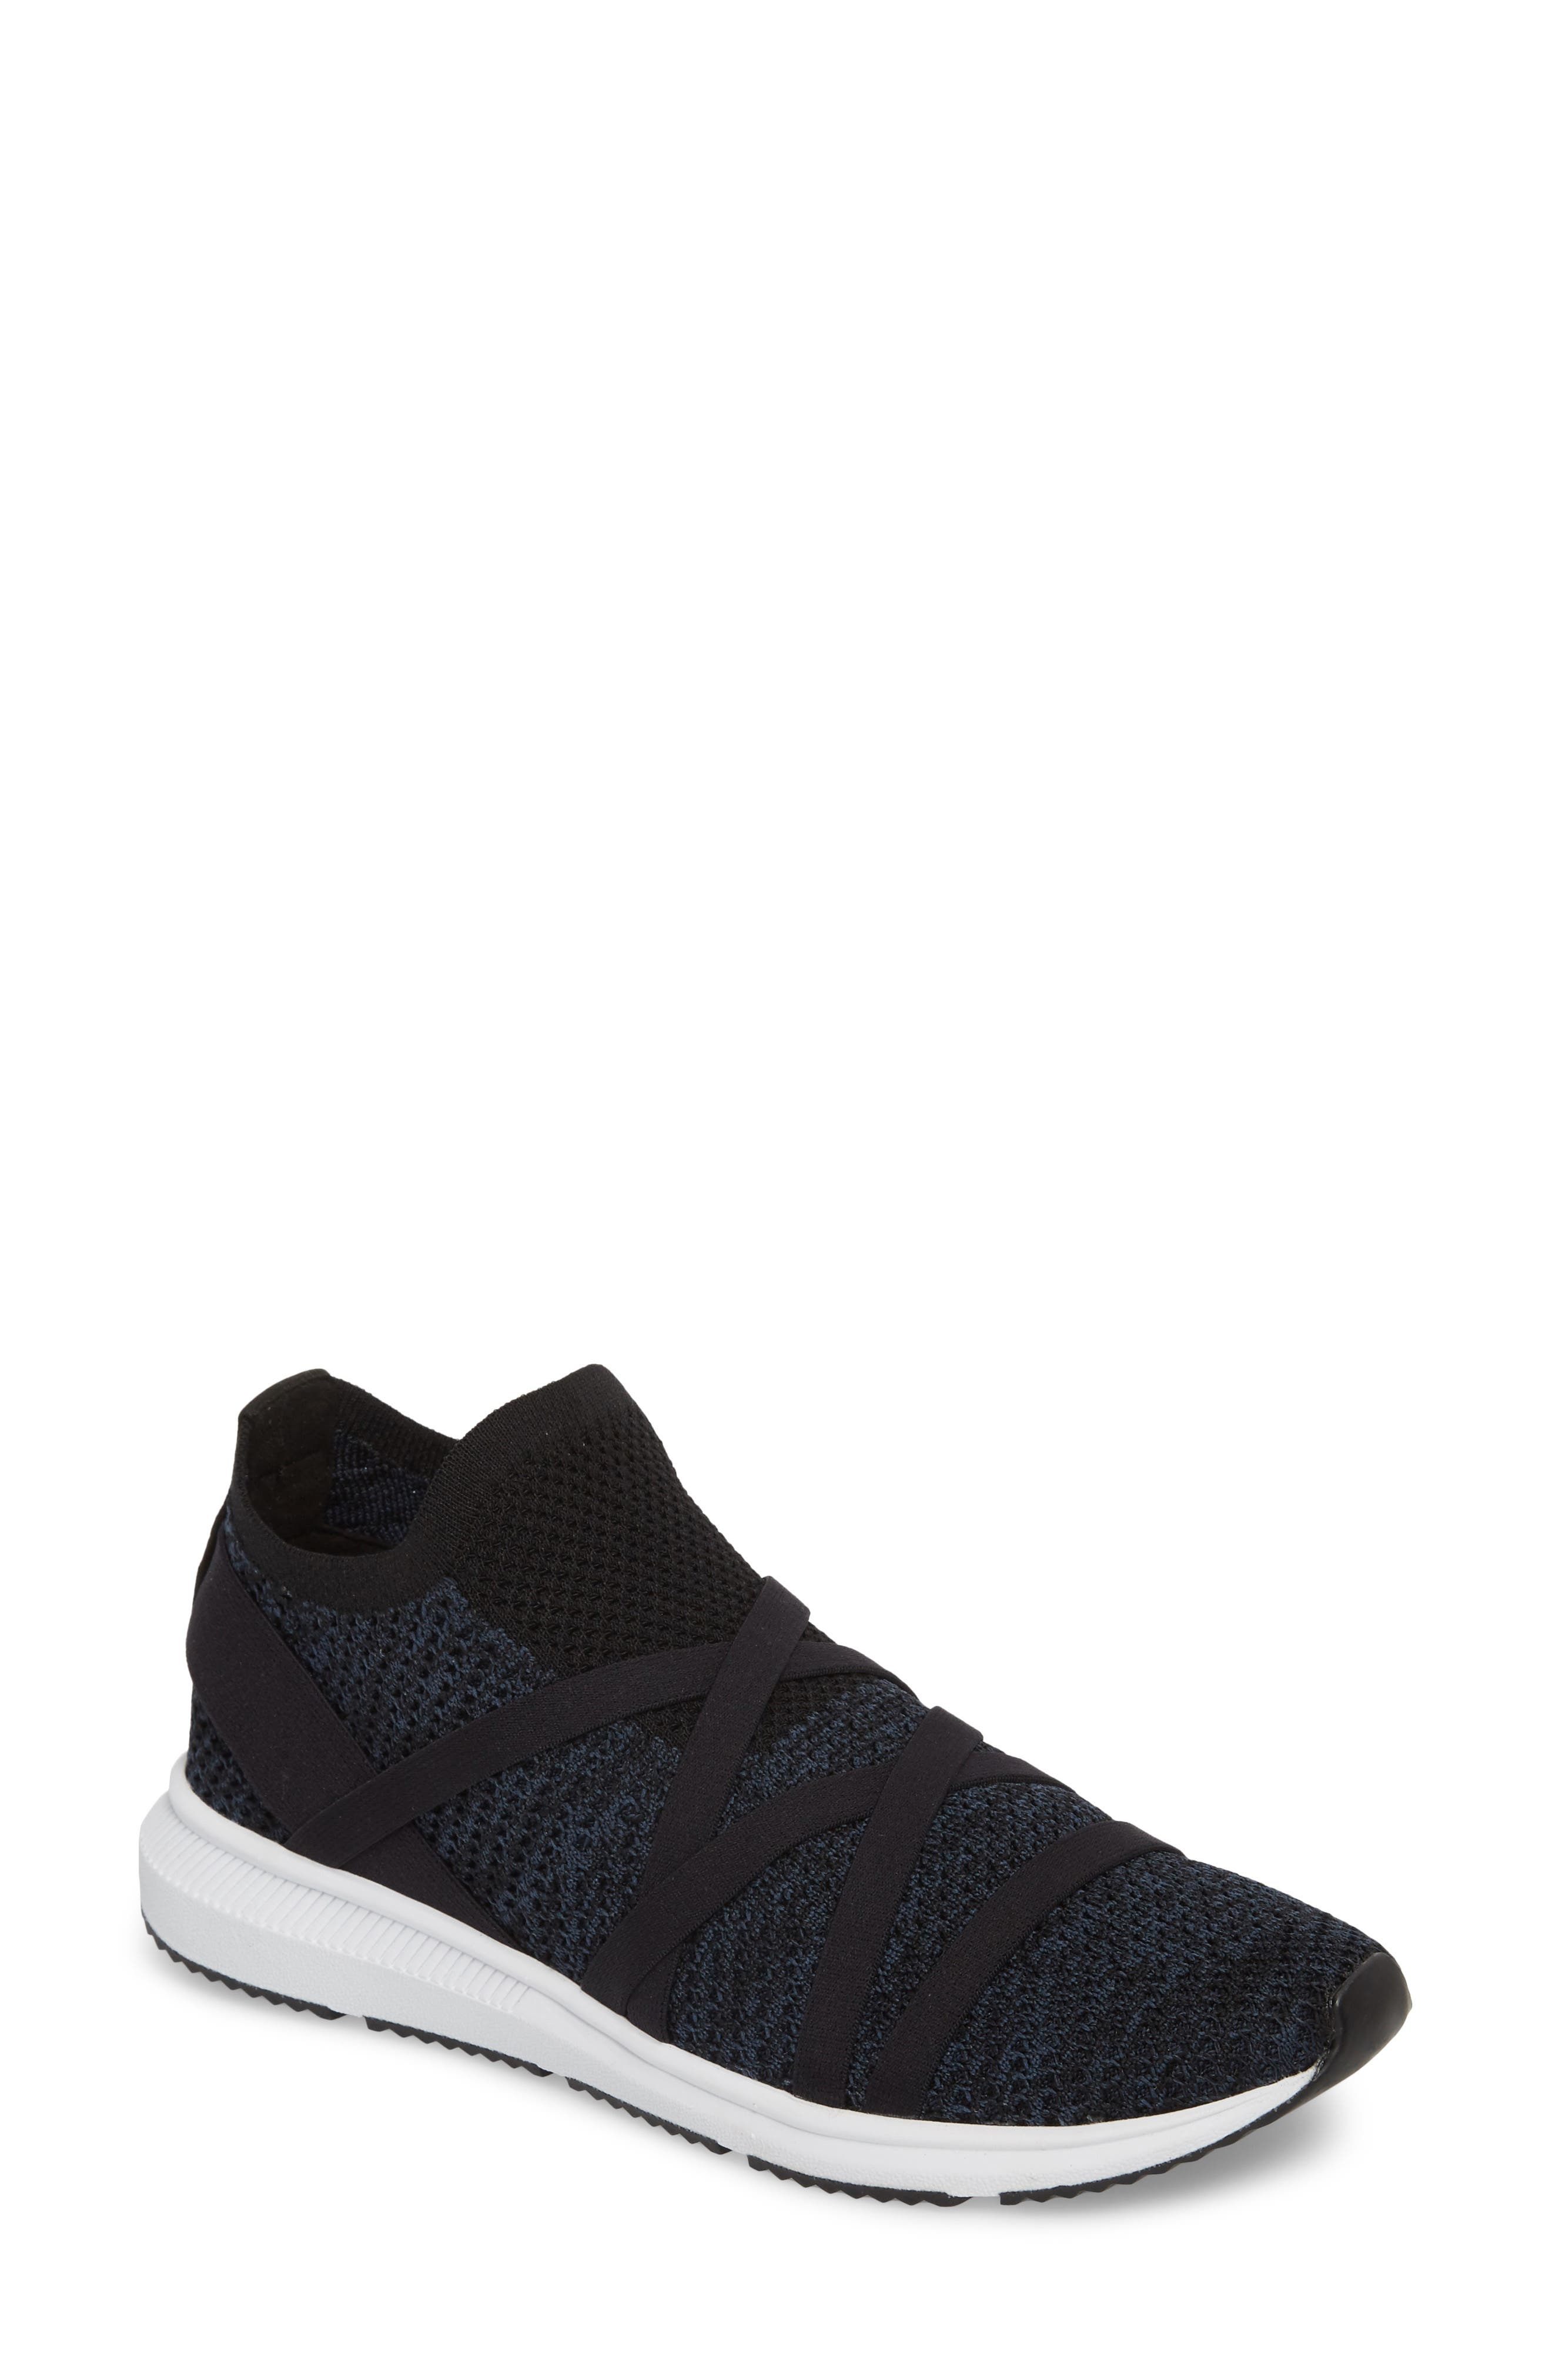 Alternate Image 1 Selected - Eileen Fisher Xanady Woven Slip-On Sneaker (Women)